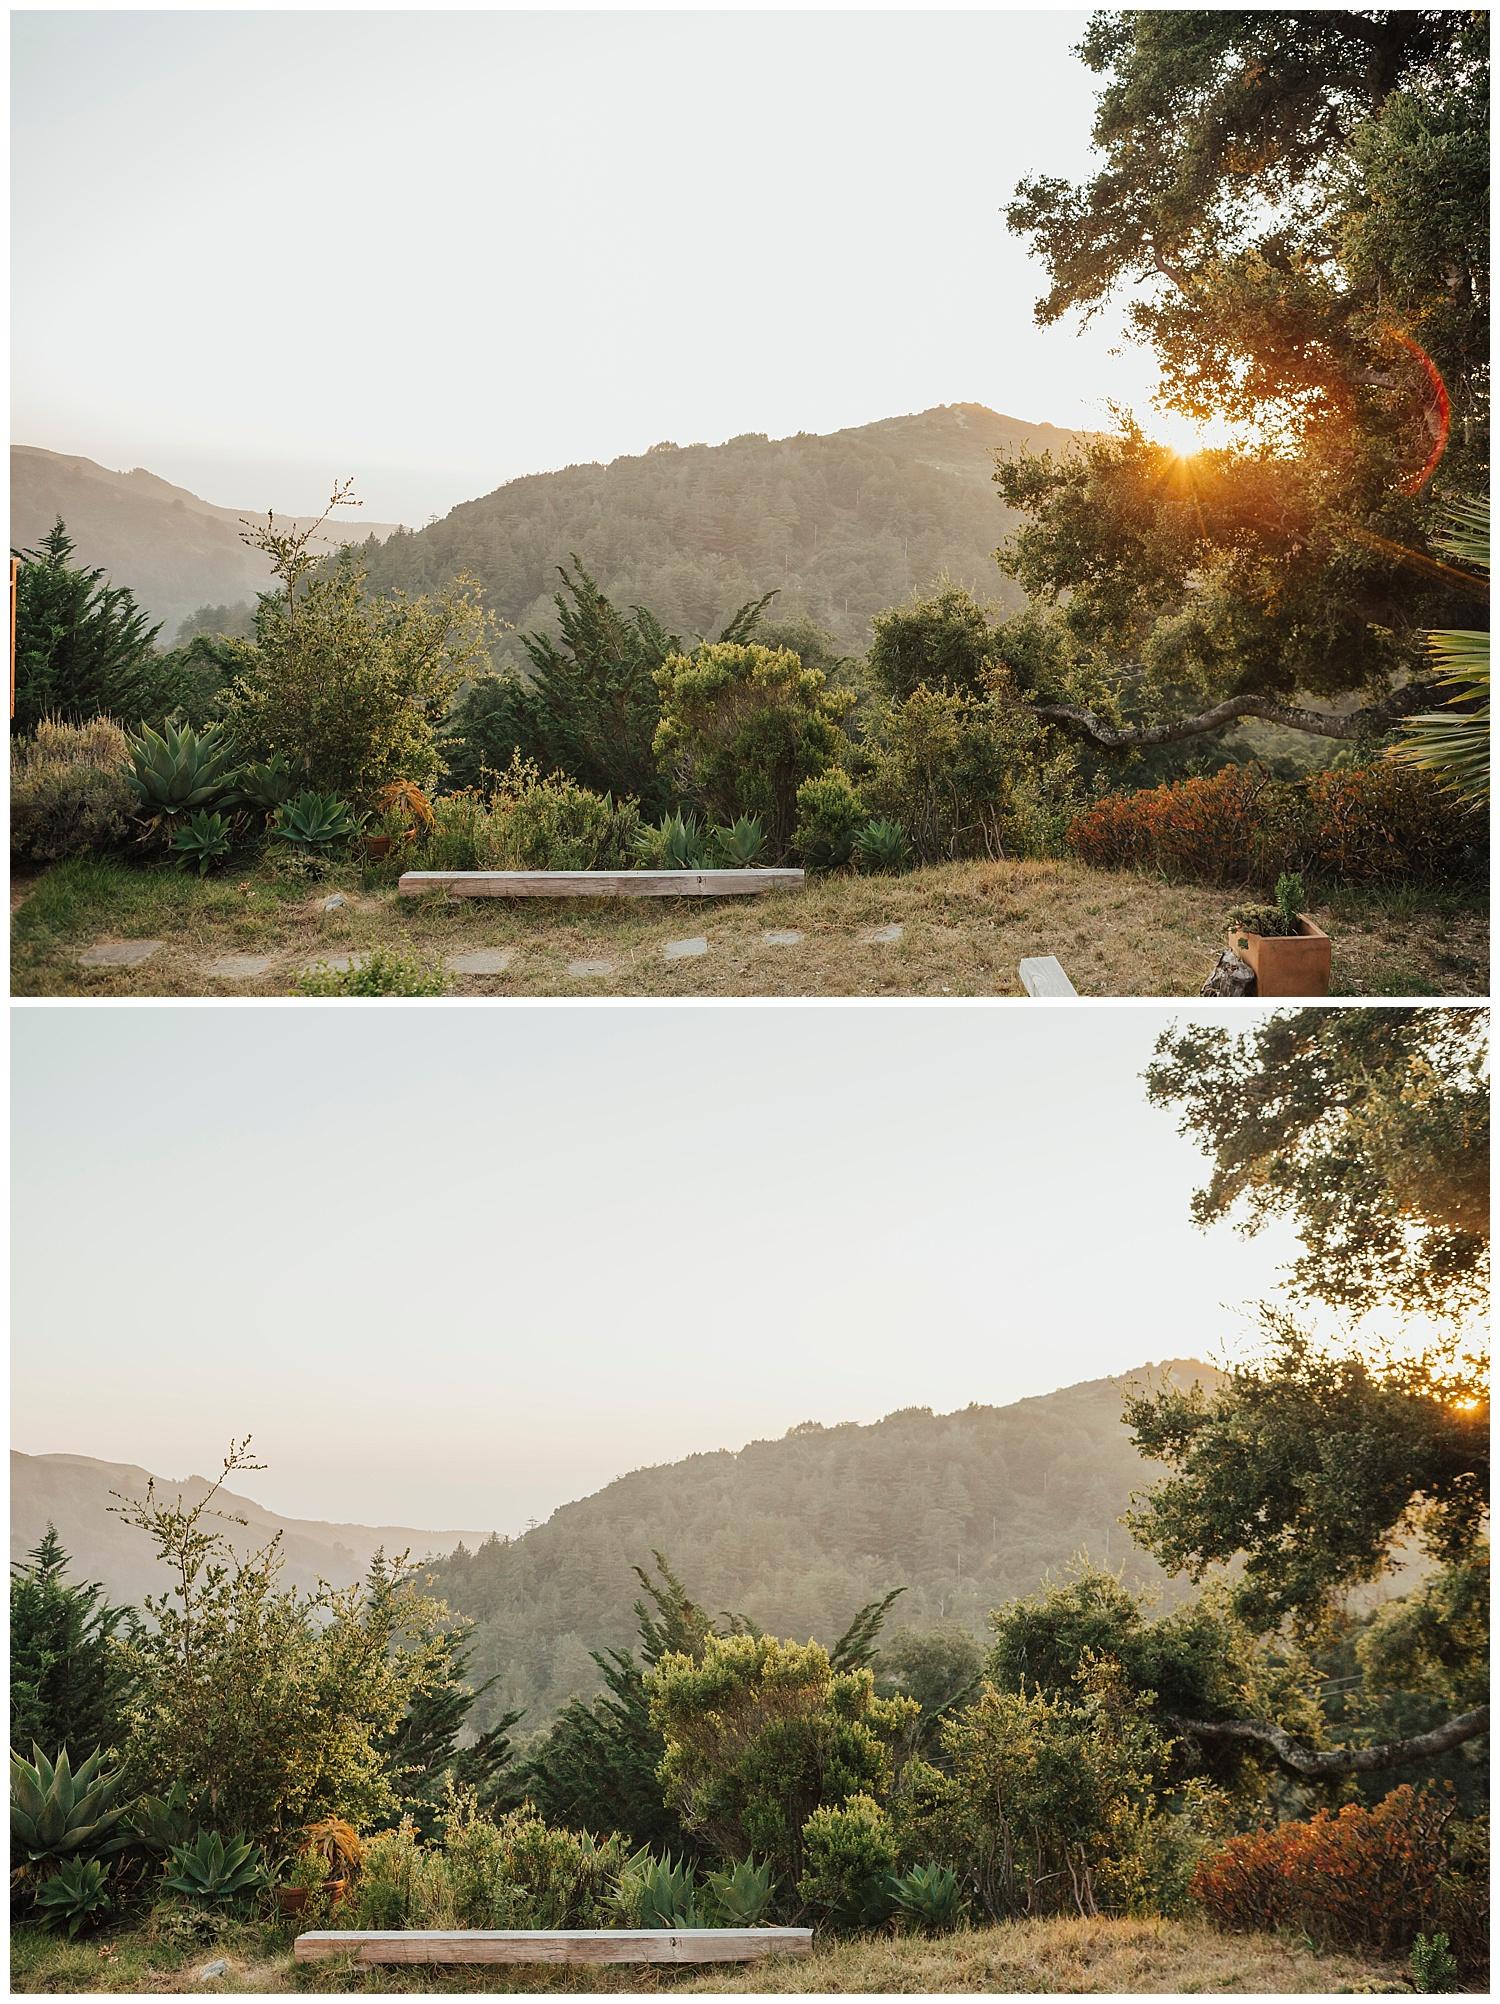 big-sur-wedding-scenery-carol-oliva-photography.jpg